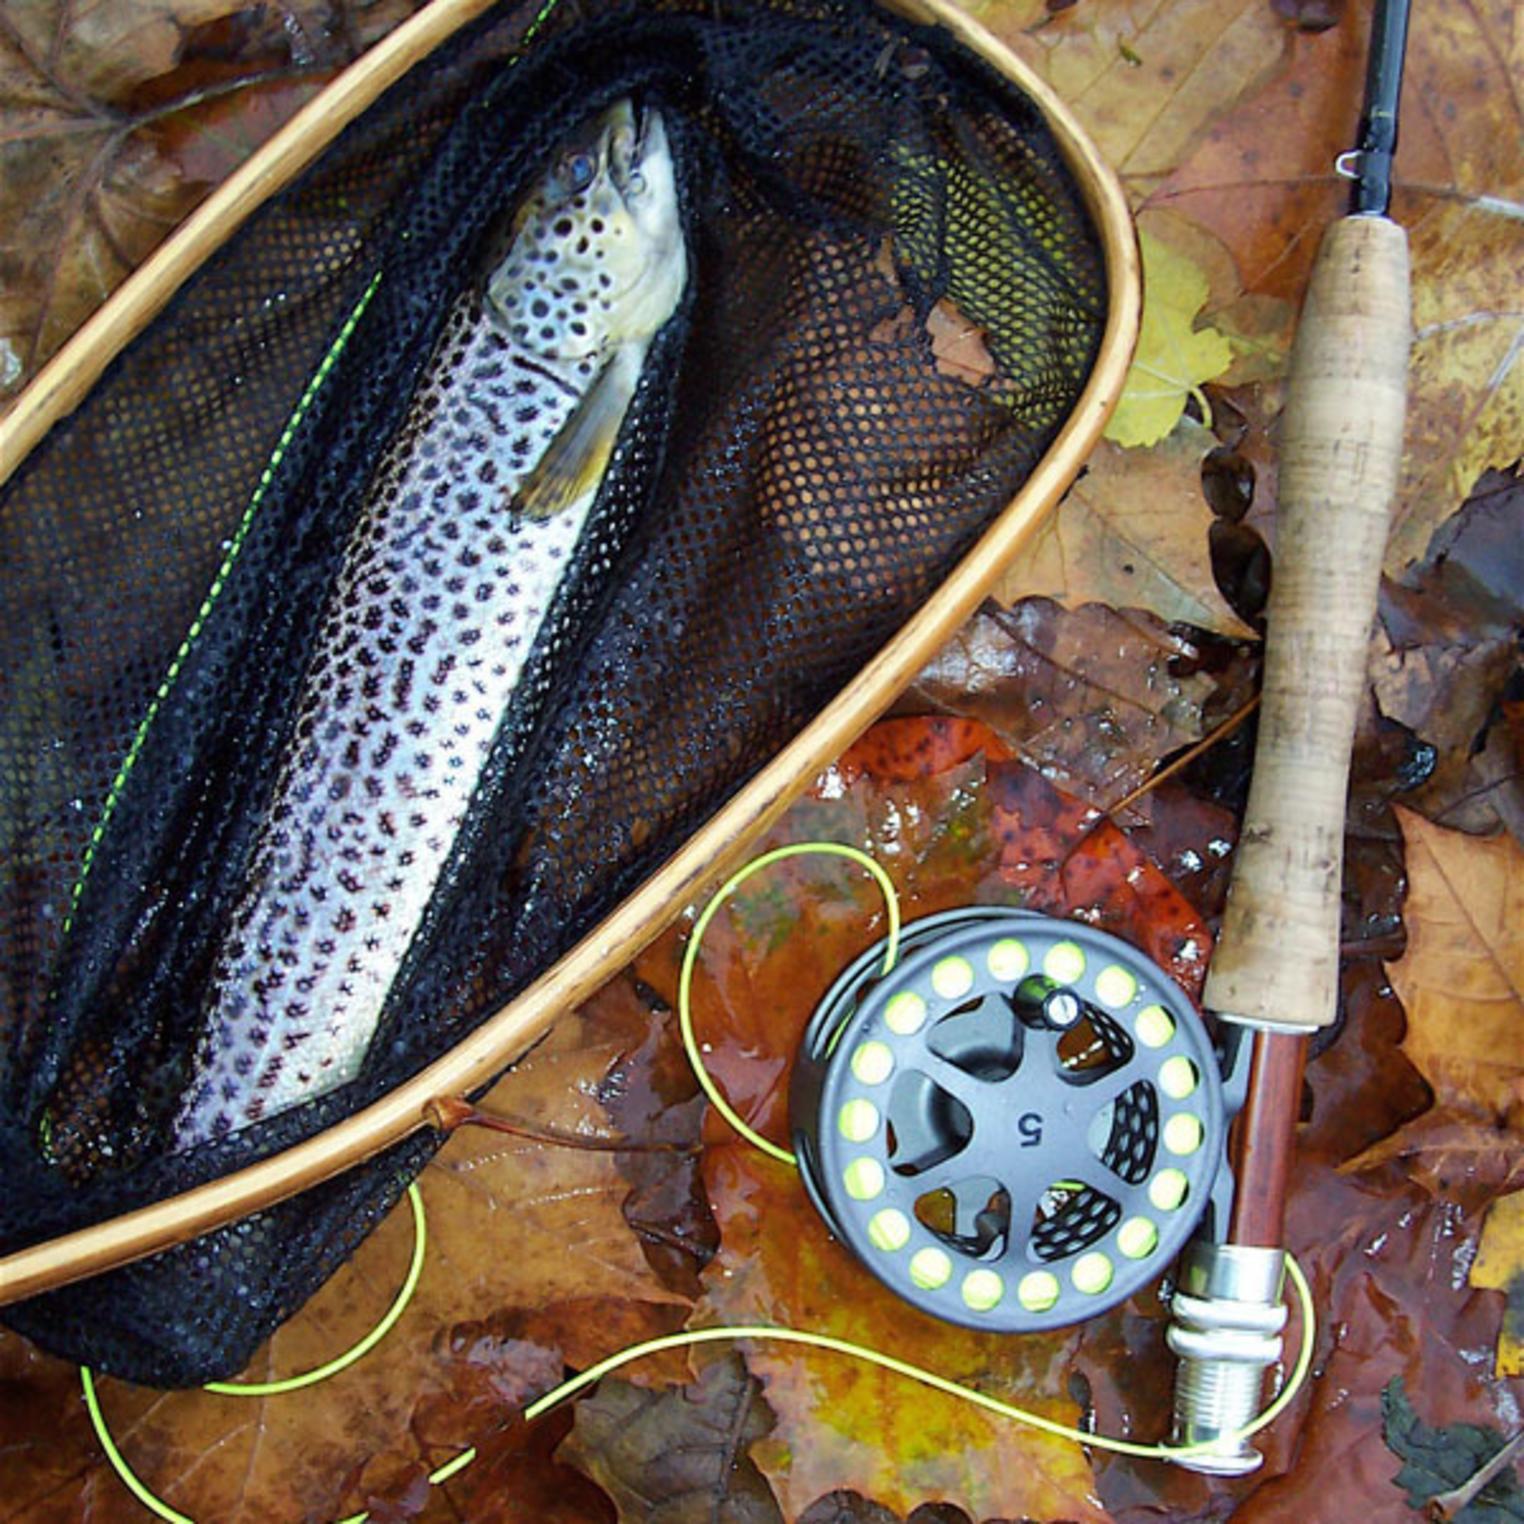 Wild trout caught on LeTort Spring Run.